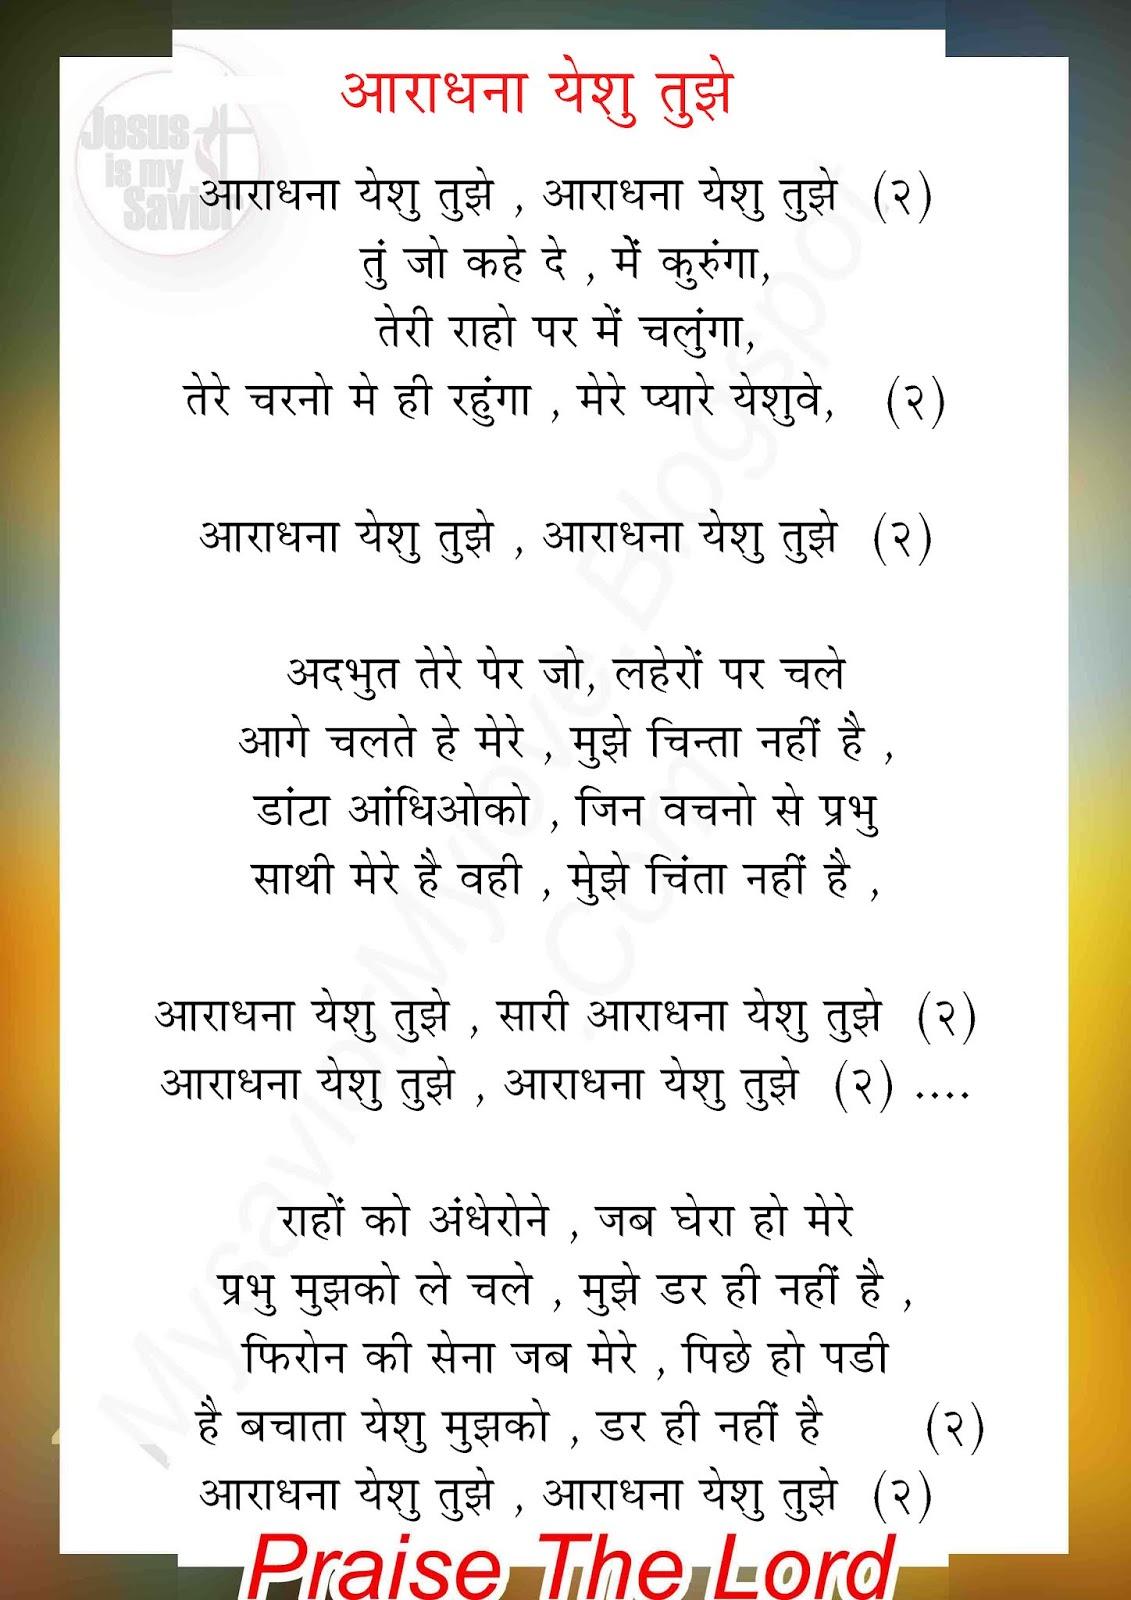 Aaradhana Yeshu Tuze Jesus Song Lyrics Hindi À¤†à¤° À¤§à¤¨ À¤¯ À¤¸ À¤¤ À¤ À¤œ À¤¸à¤¸ À¤¸ À¤¨ À¤— À¤² À¤° À¤• À¤¸ À¤¹ À¤¦ New Christian Song S Lyrics Hindi worship songs lyrics with translations: aaradhana yeshu tuze jesus song lyrics